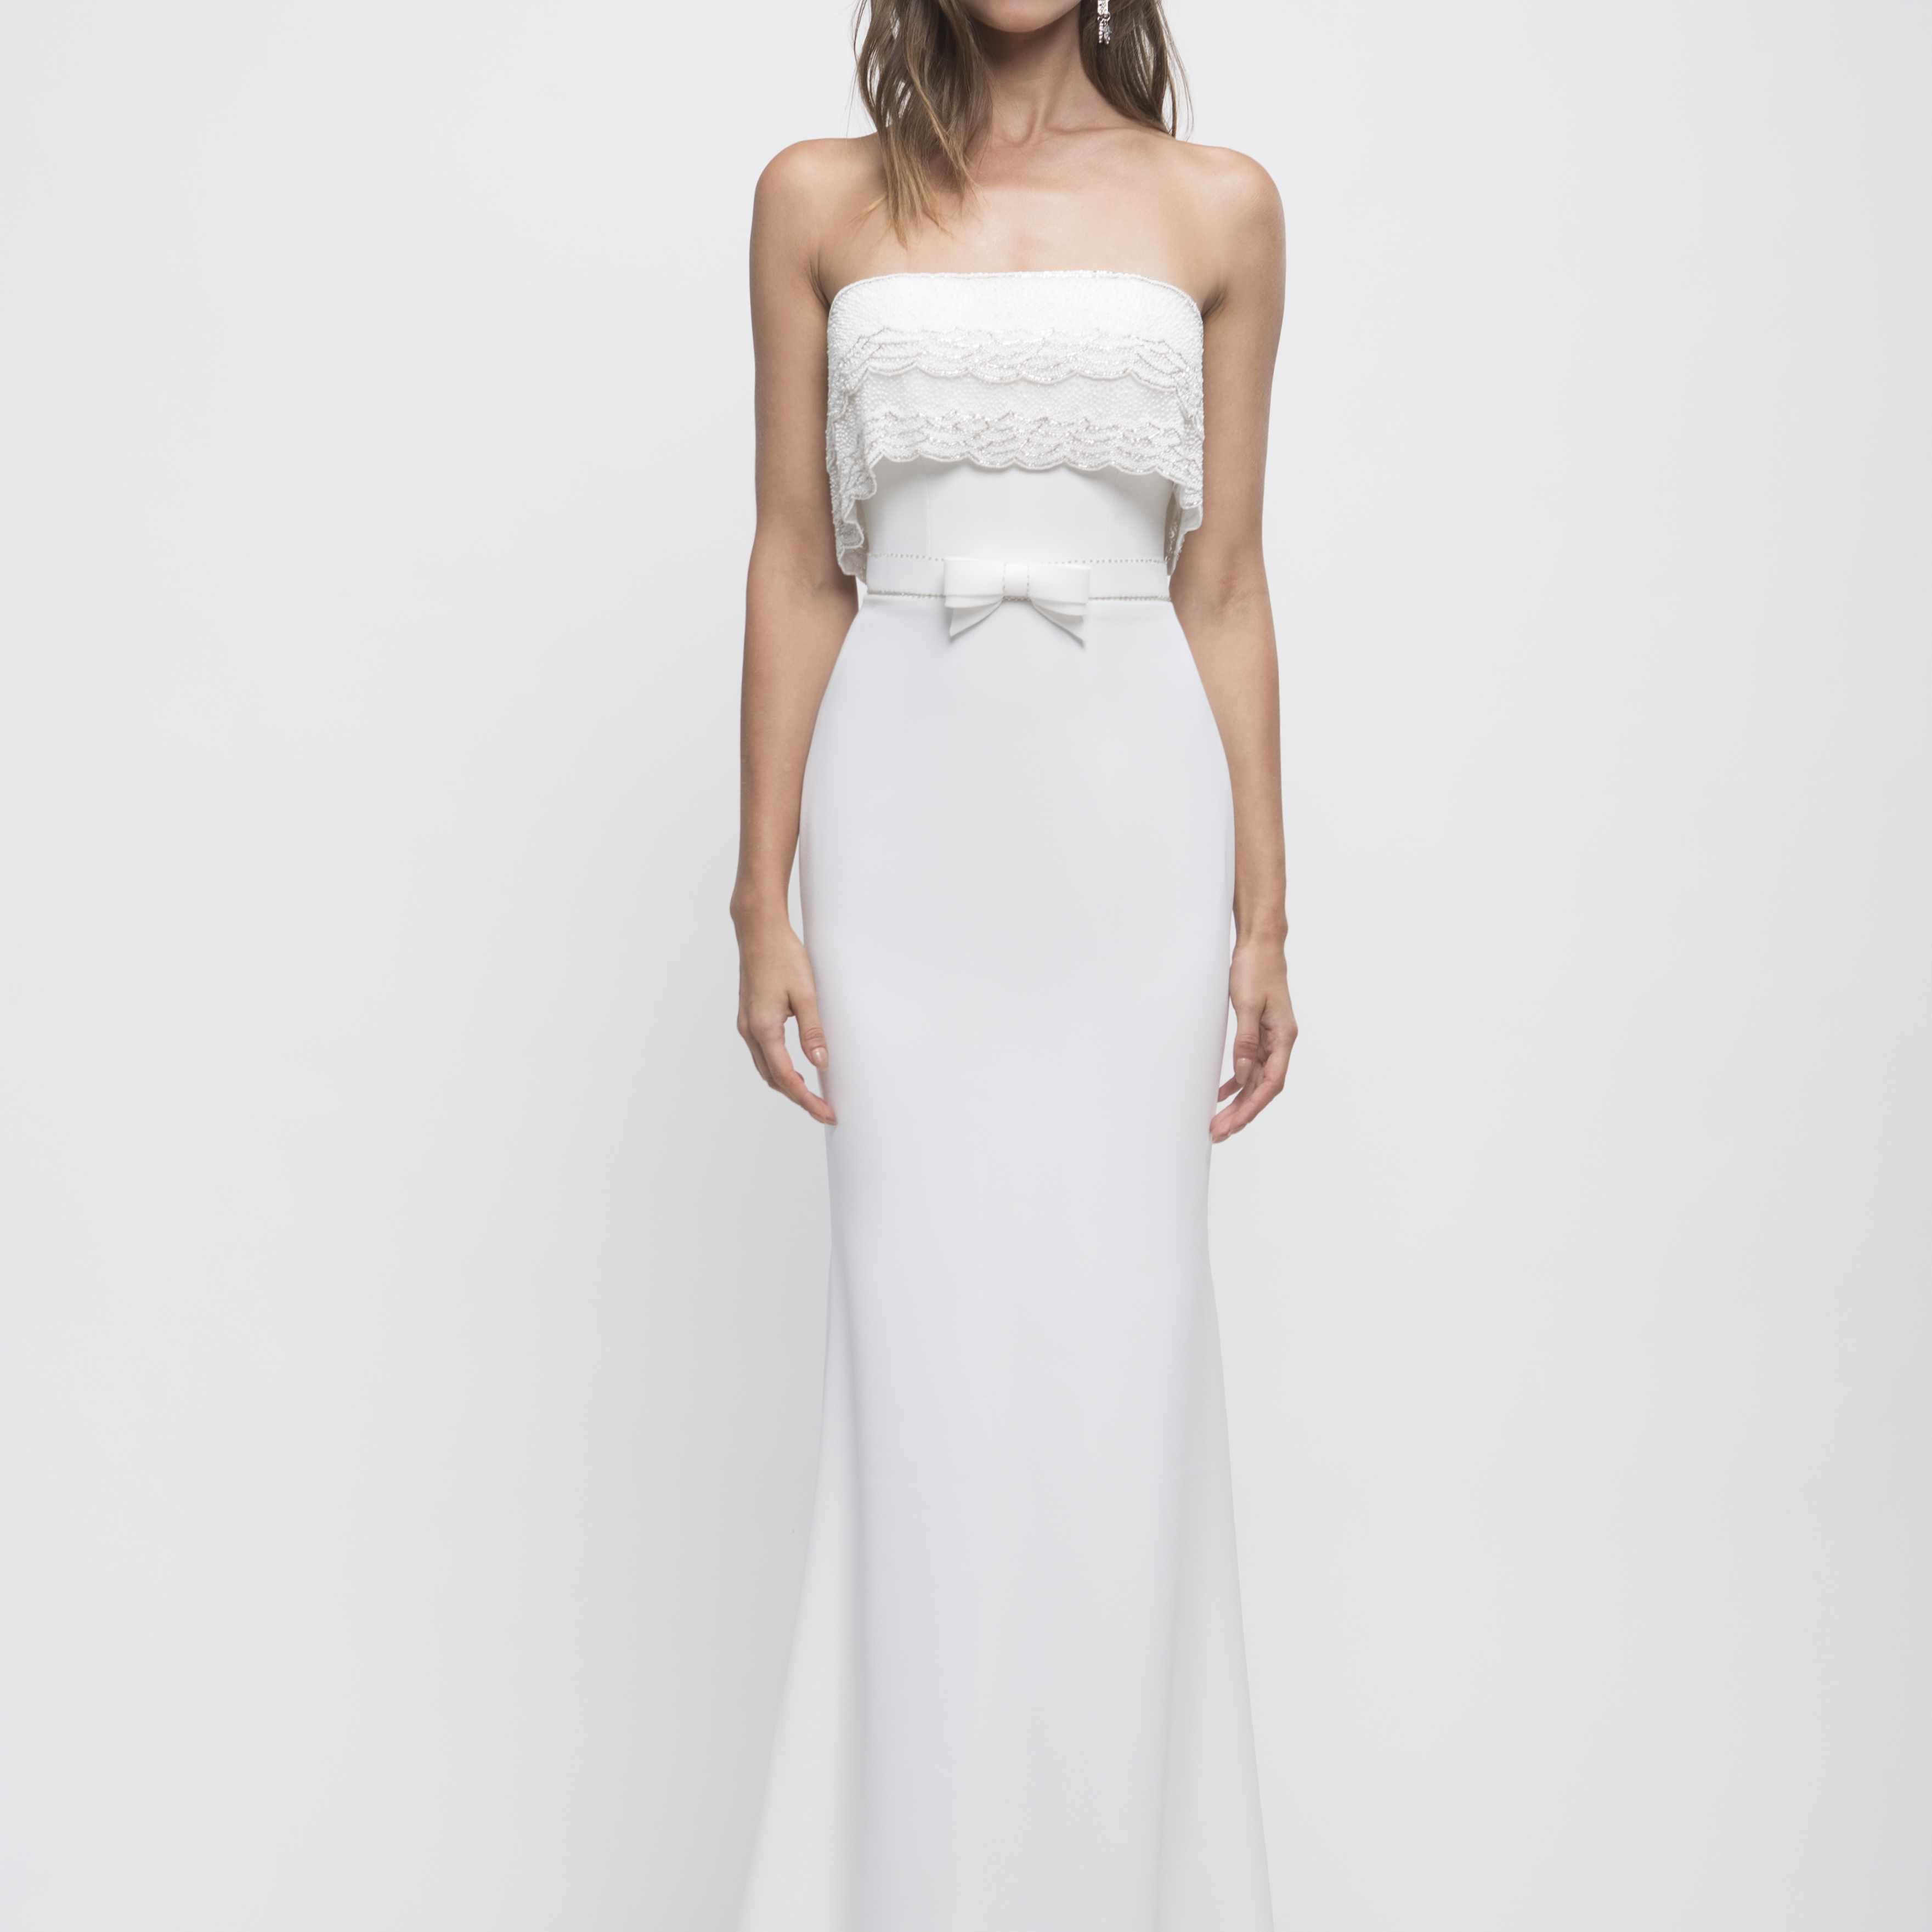 Saryne wedding dress